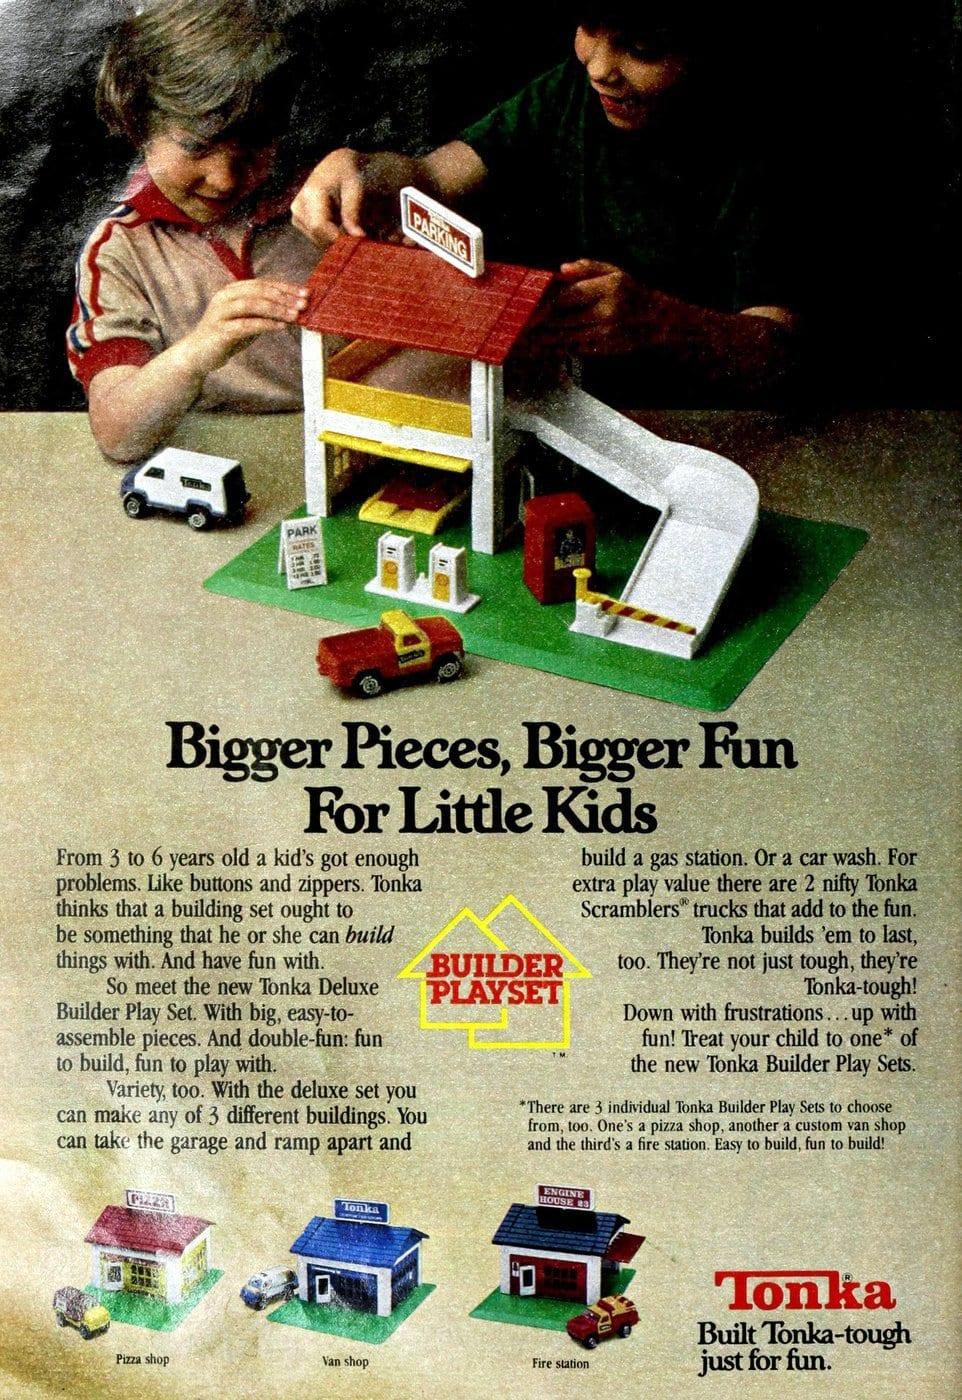 Tonka Builder playsets toys (1979)